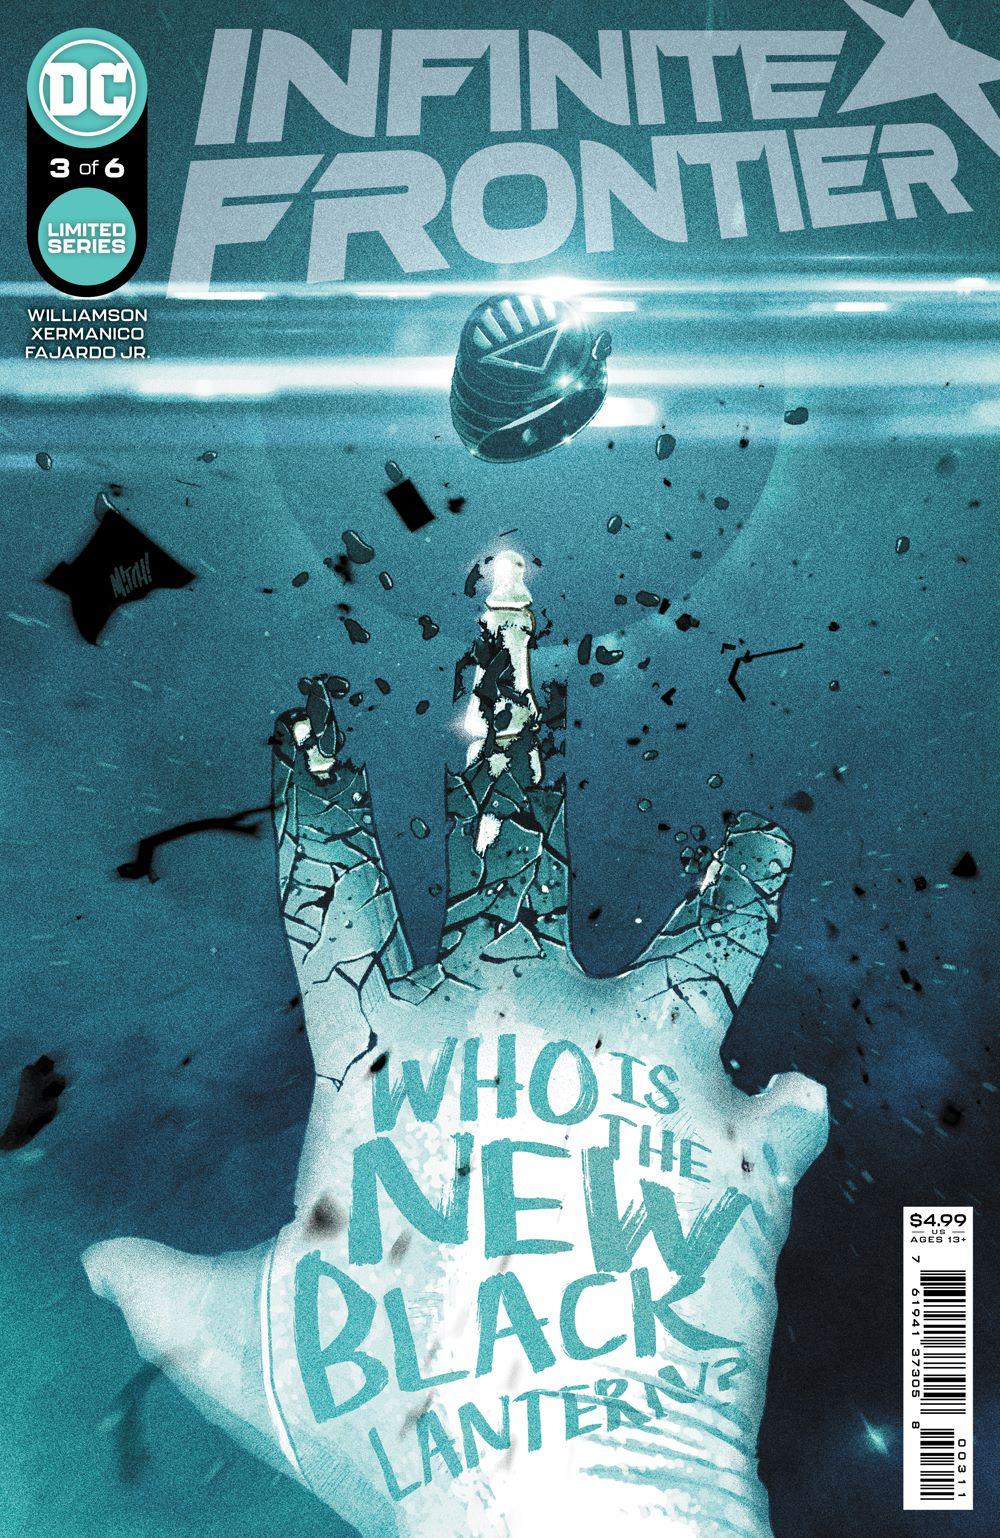 INFINITE_FRONTIER_Cv3 DC Comics July 2021 Solicitations